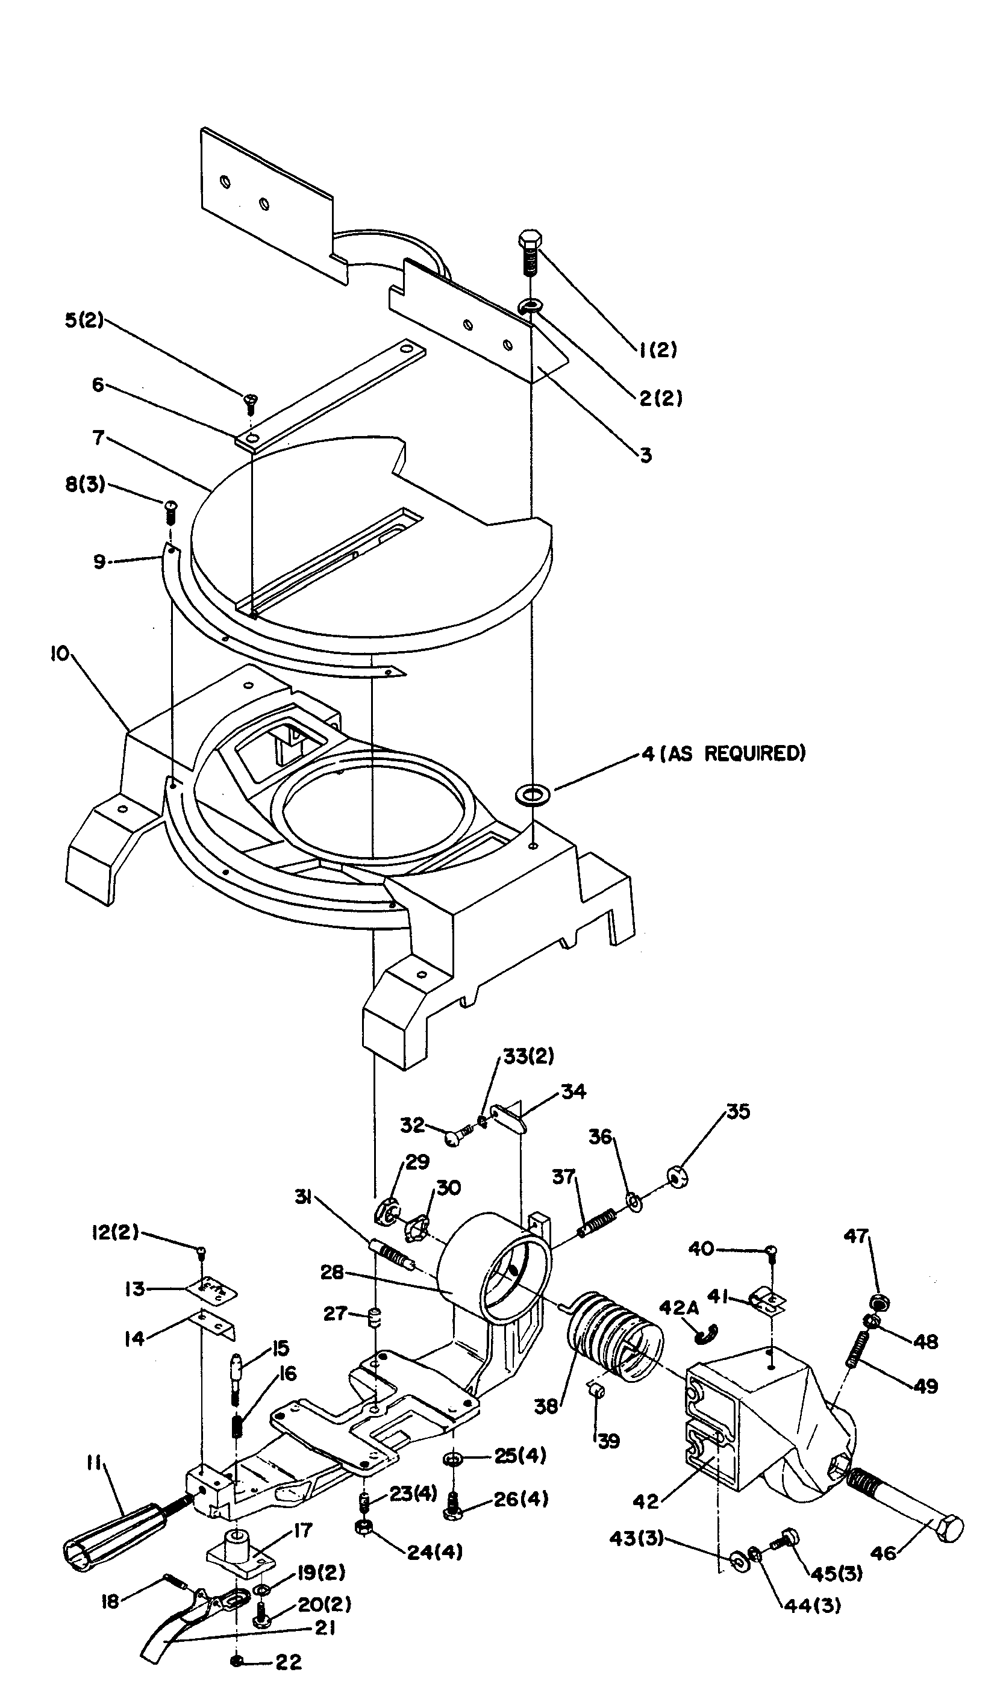 Delta Jointer Wiring Diagram Millermatic 140 Wiring